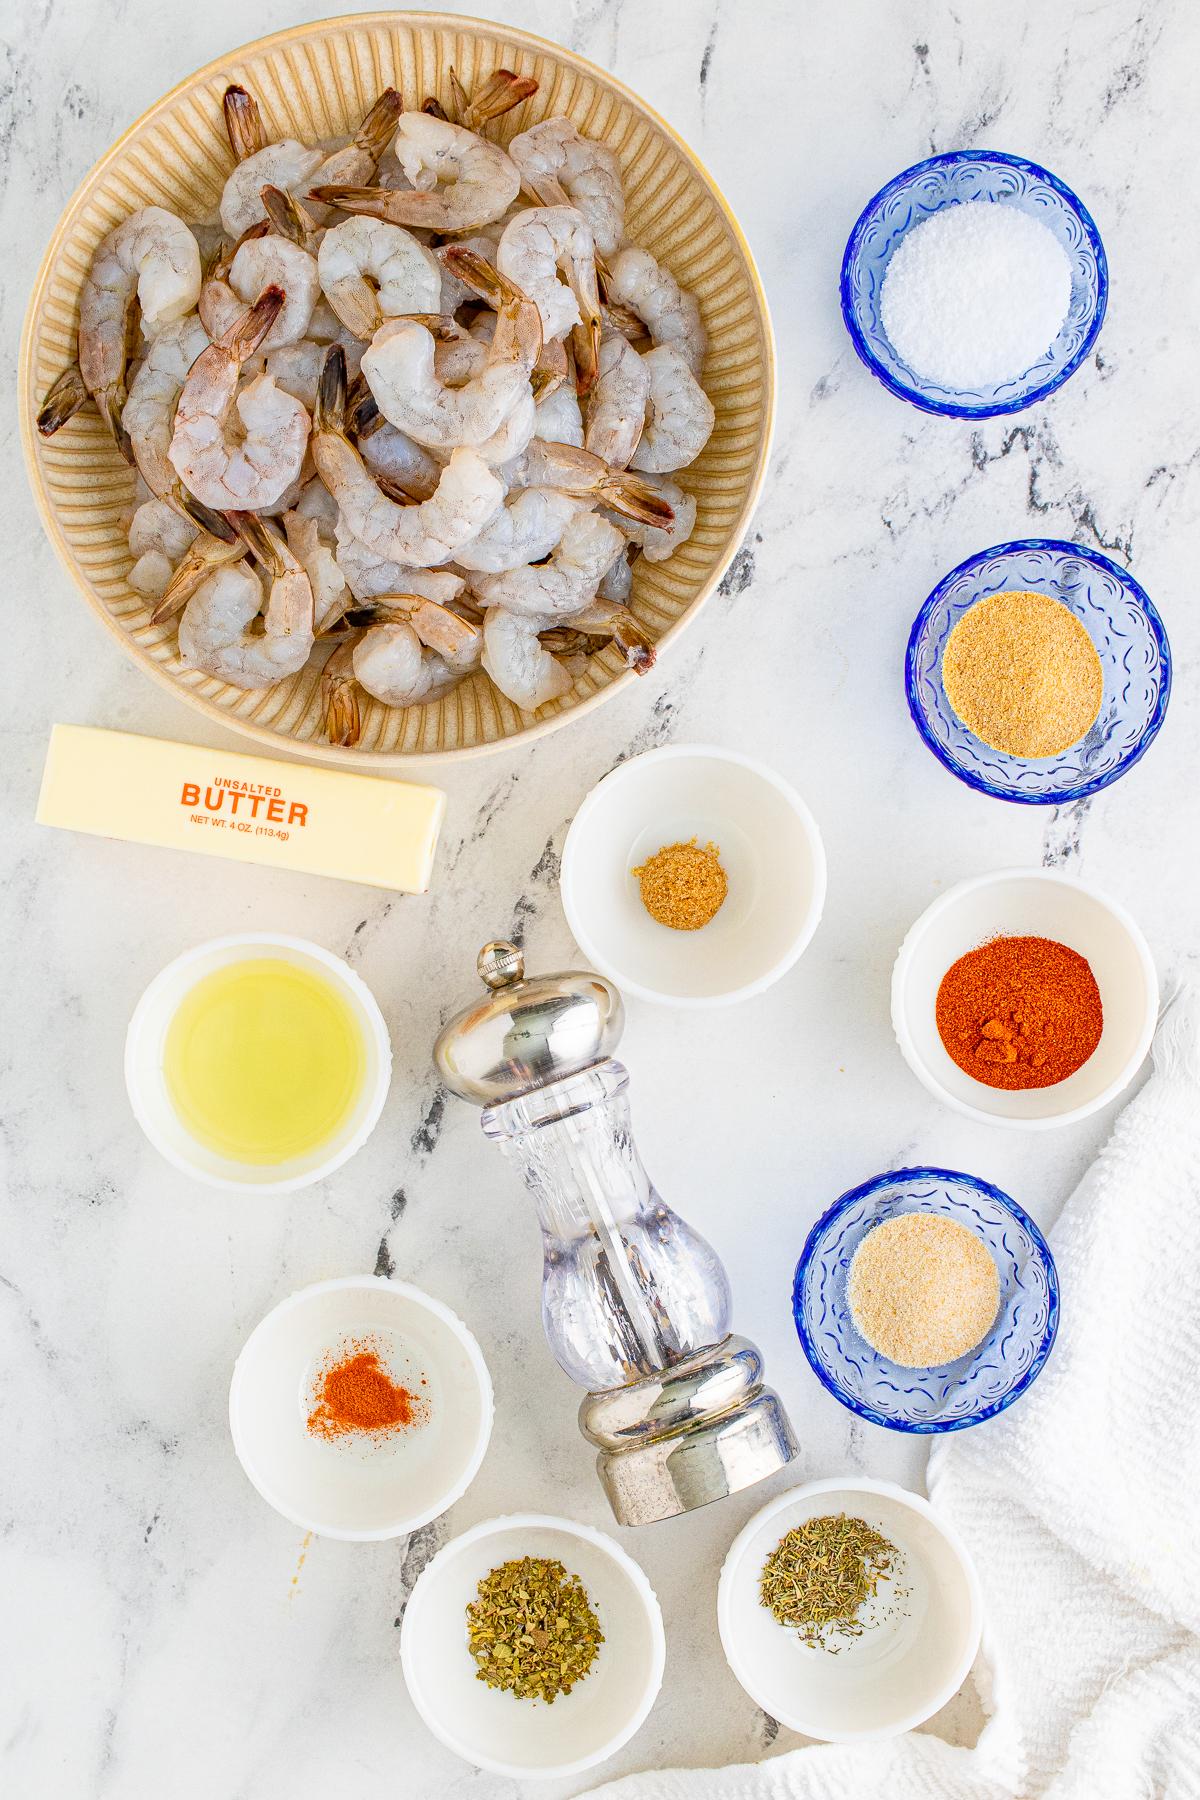 Ingredients needed to make Blackened Shrimp